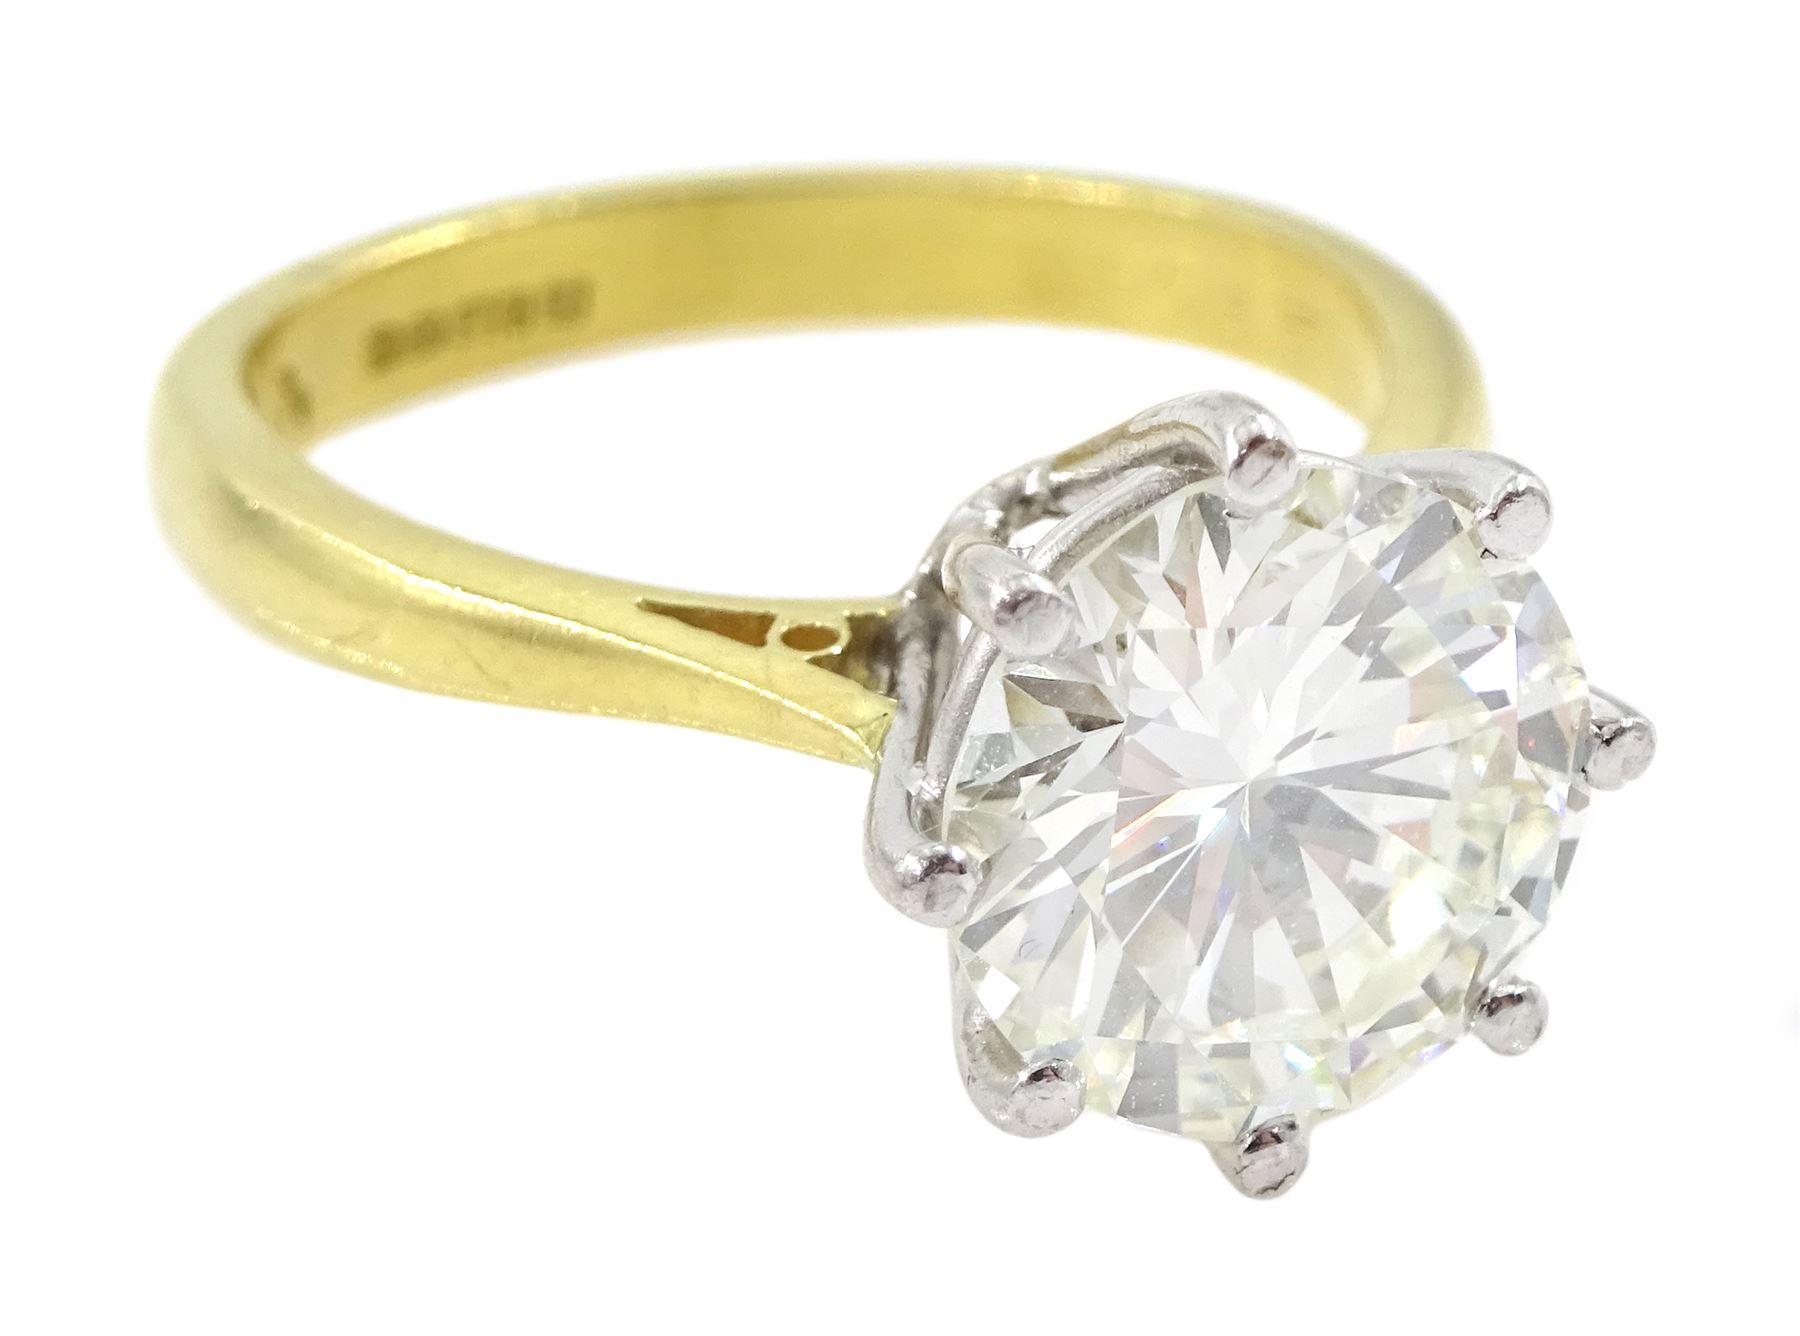 18ct gold round brilliant cut diamond ring - Image 7 of 7